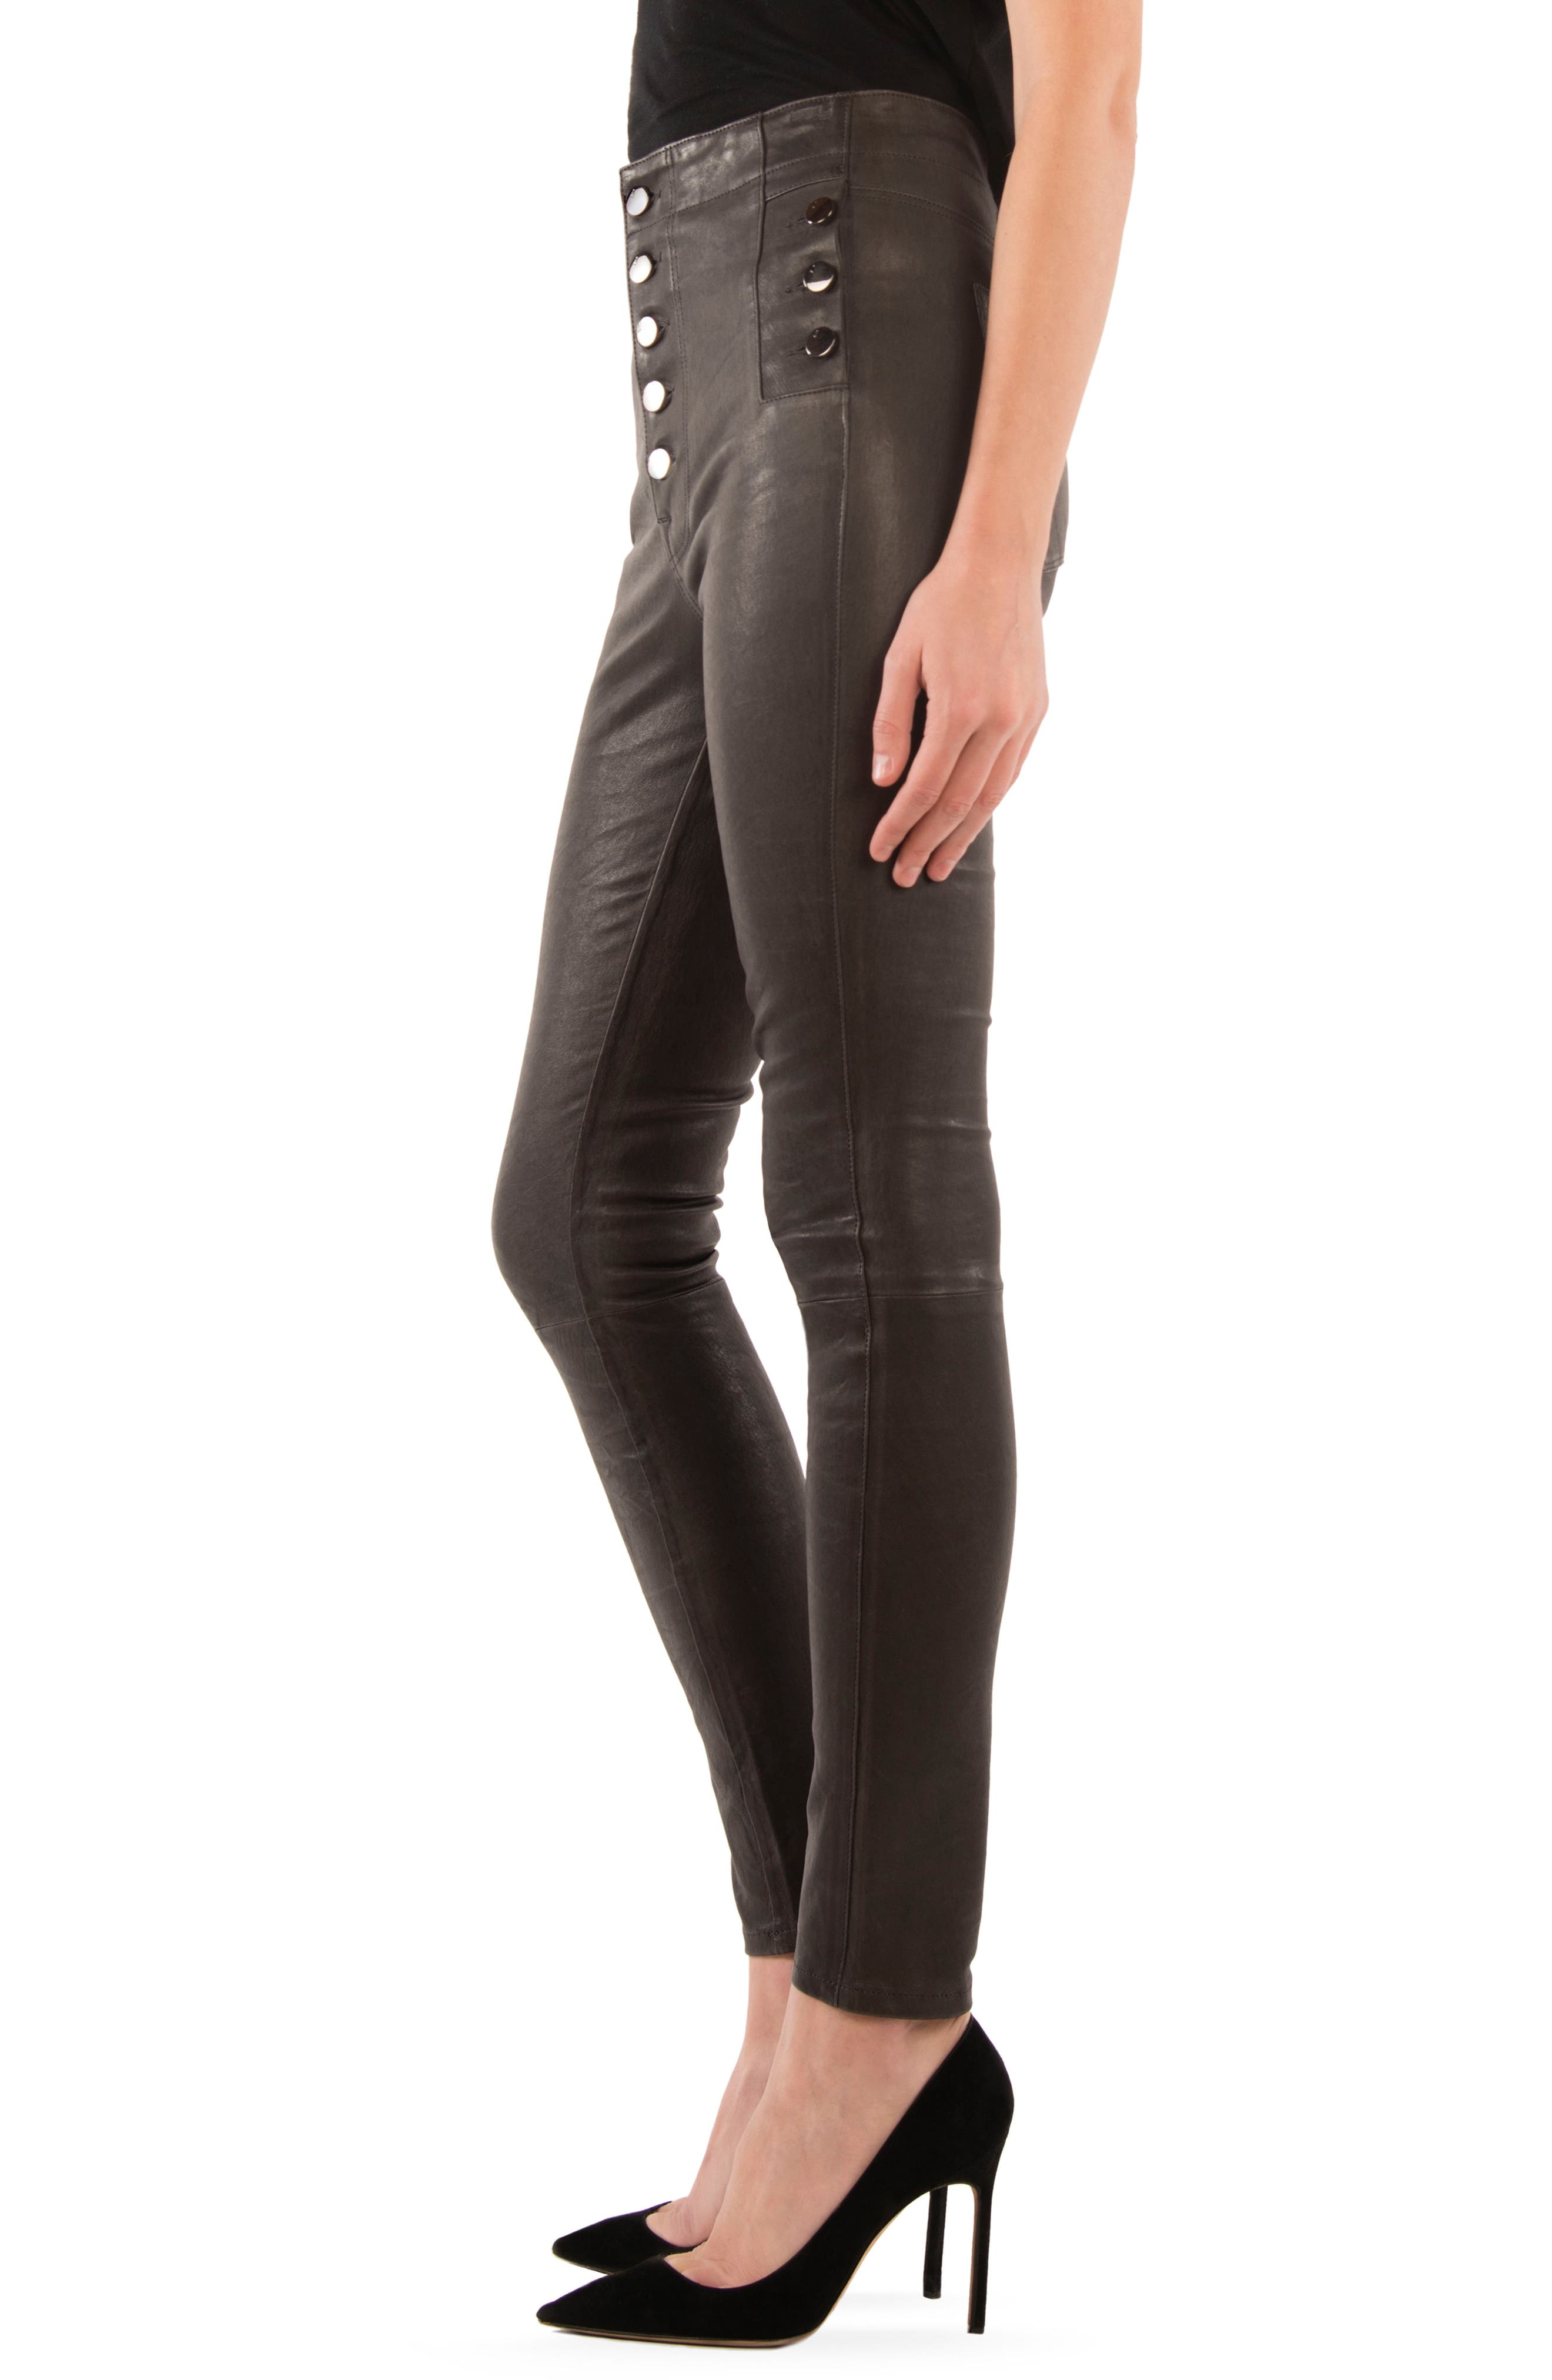 Natasha High Waist Skinny Leather Pants,                             Alternate thumbnail 3, color,                             039